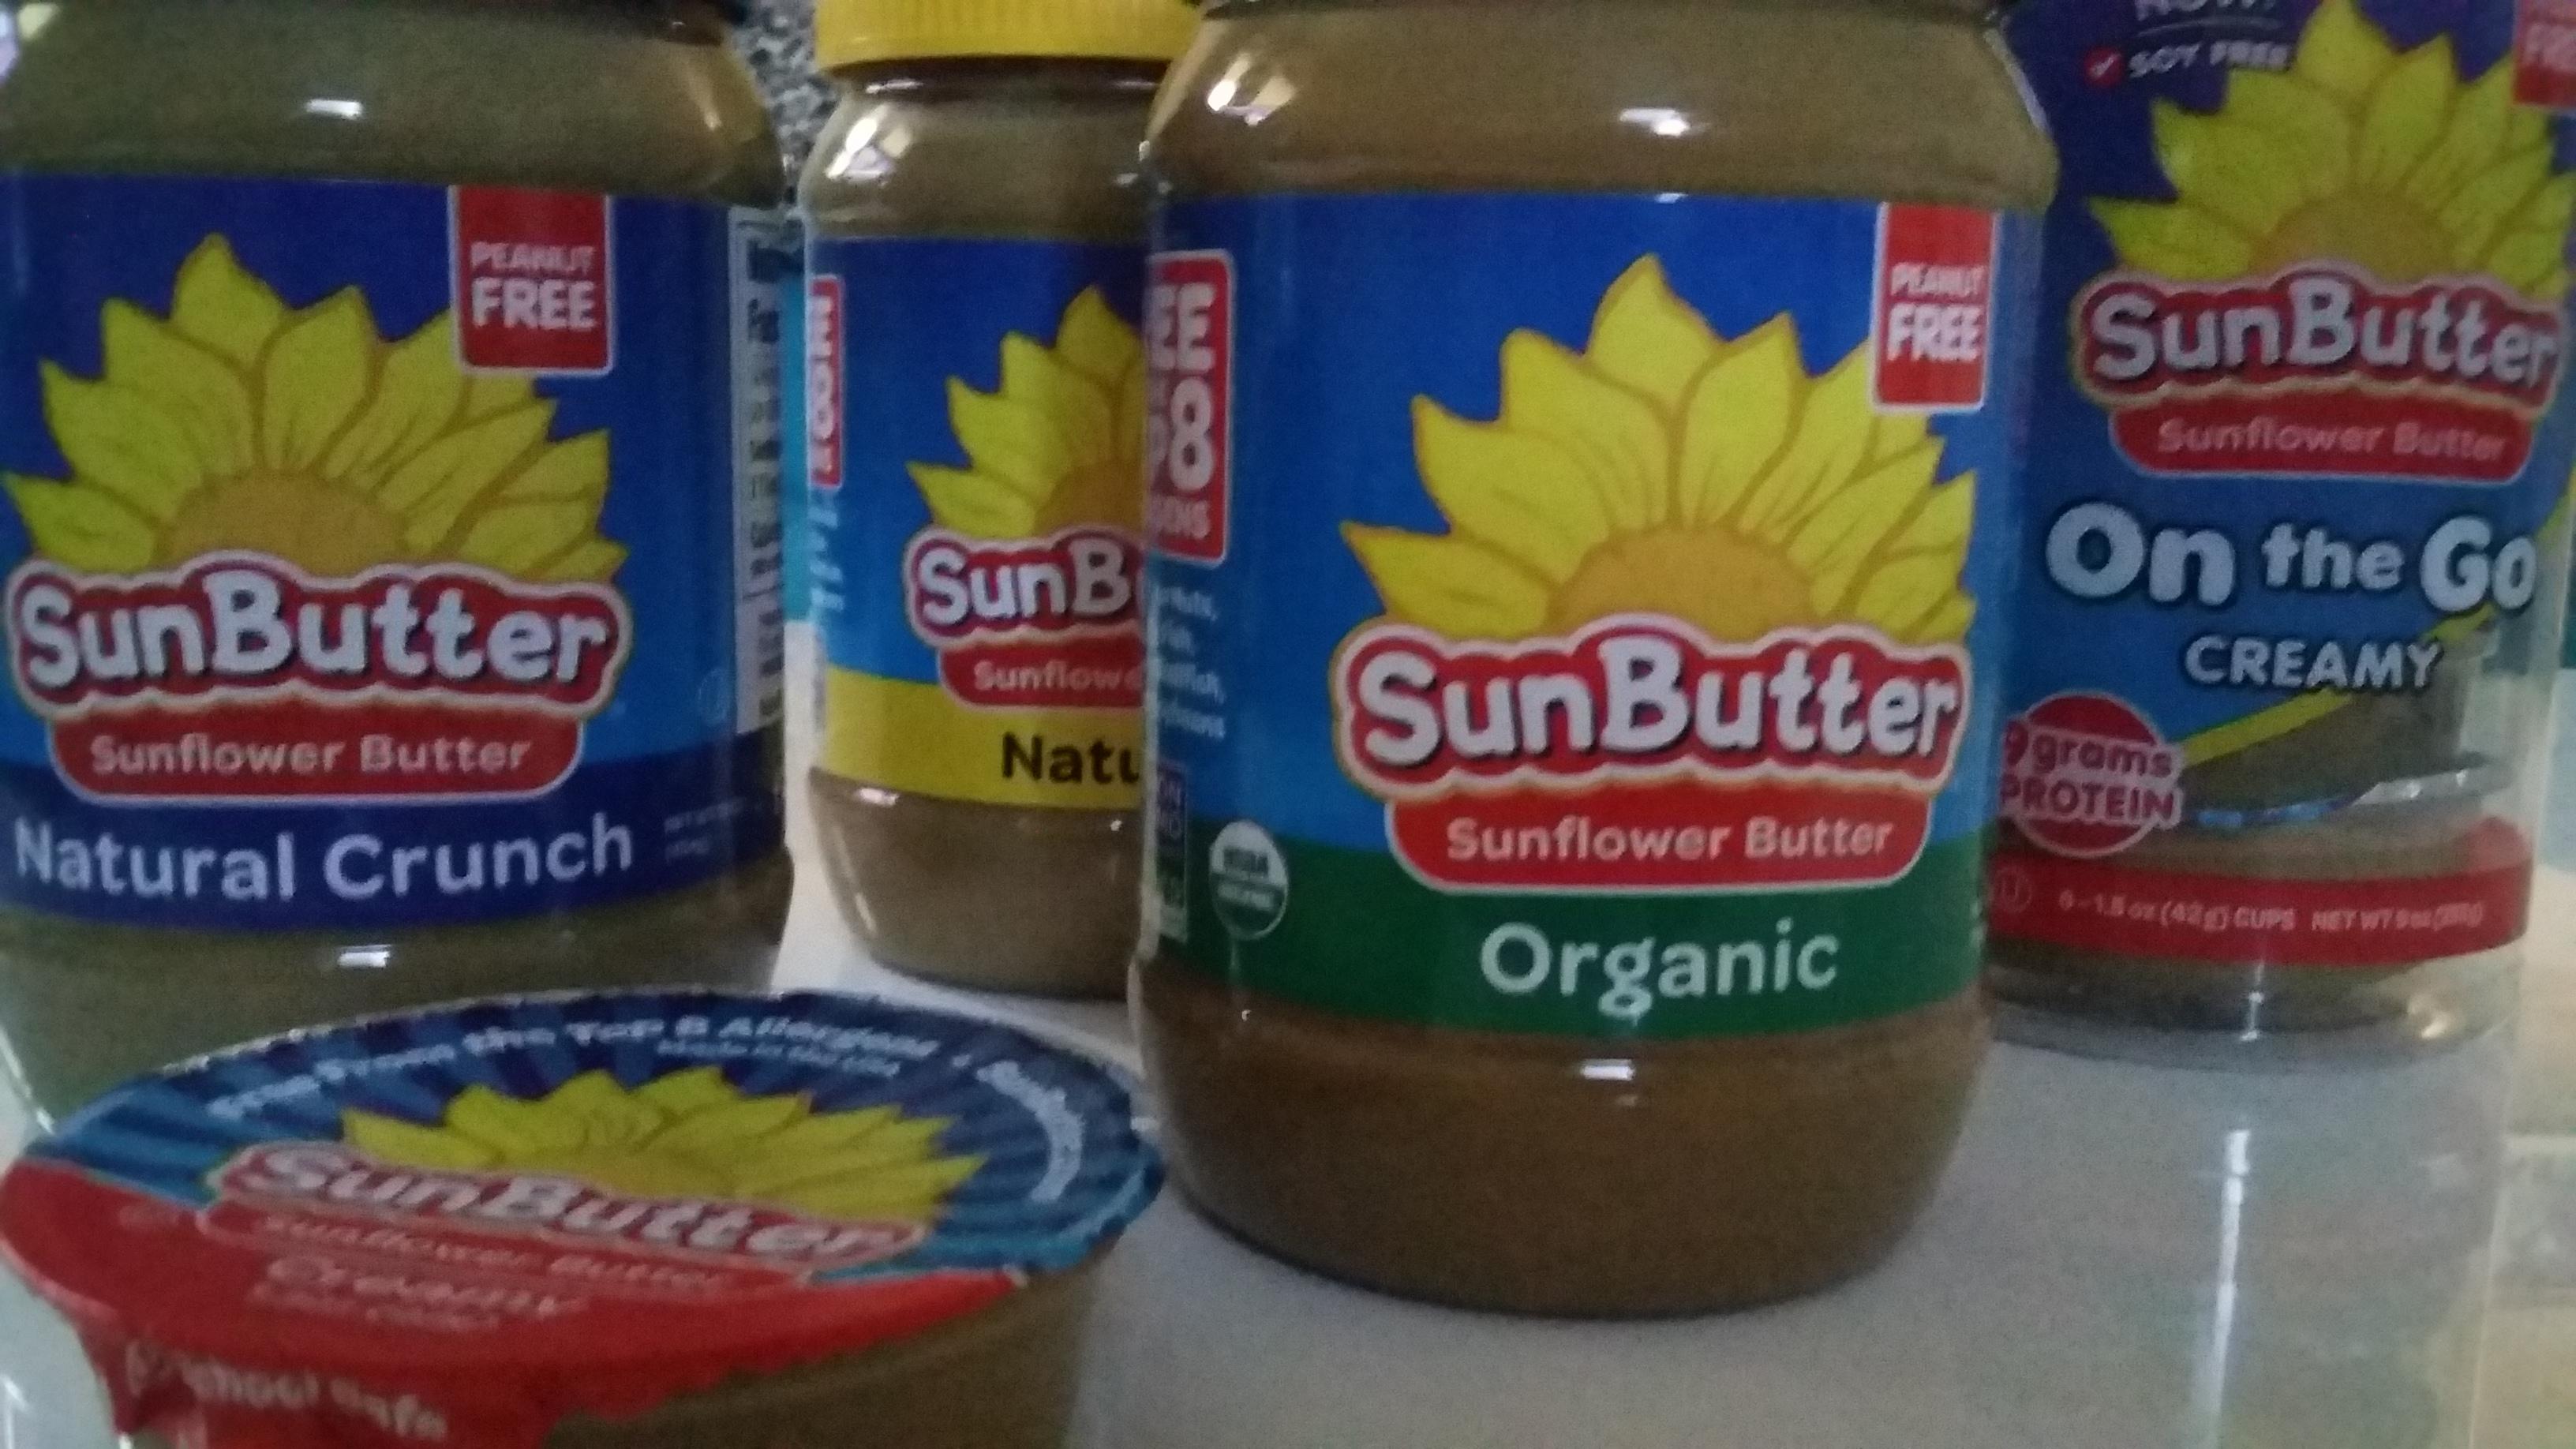 Allergic to peanuts? You'll want this product. #sunbuter #momsmeet #greenmomsmeet #ad